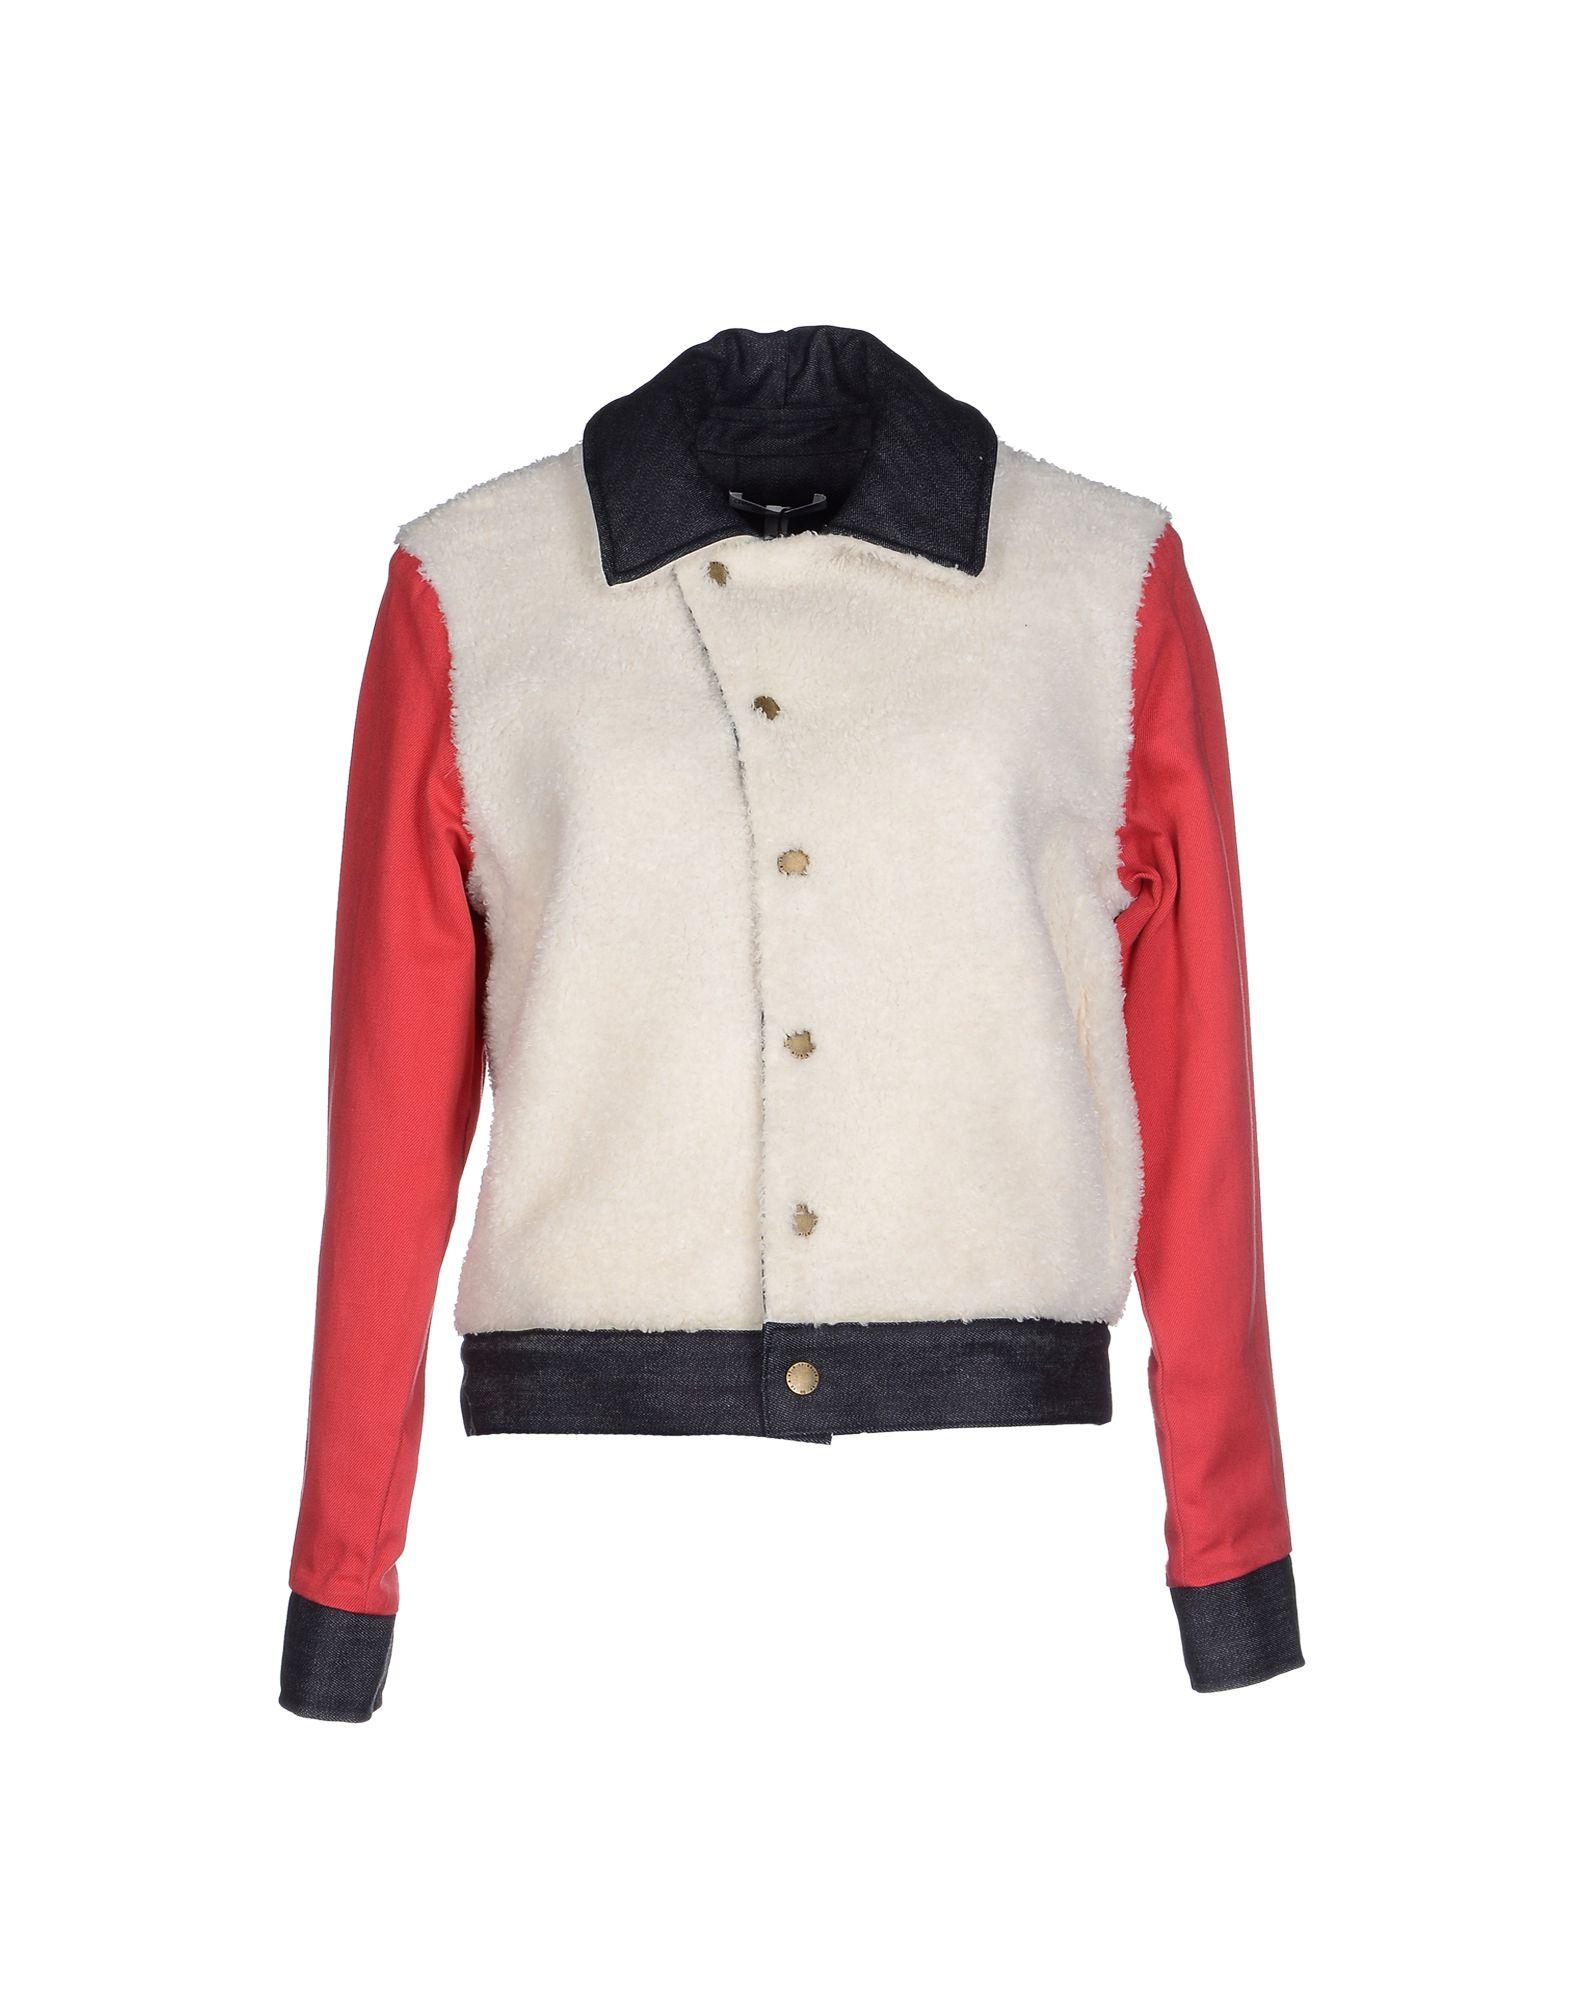 CURRENT/ELLIOT + CHARLOTTE GAINSBOURG Куртка